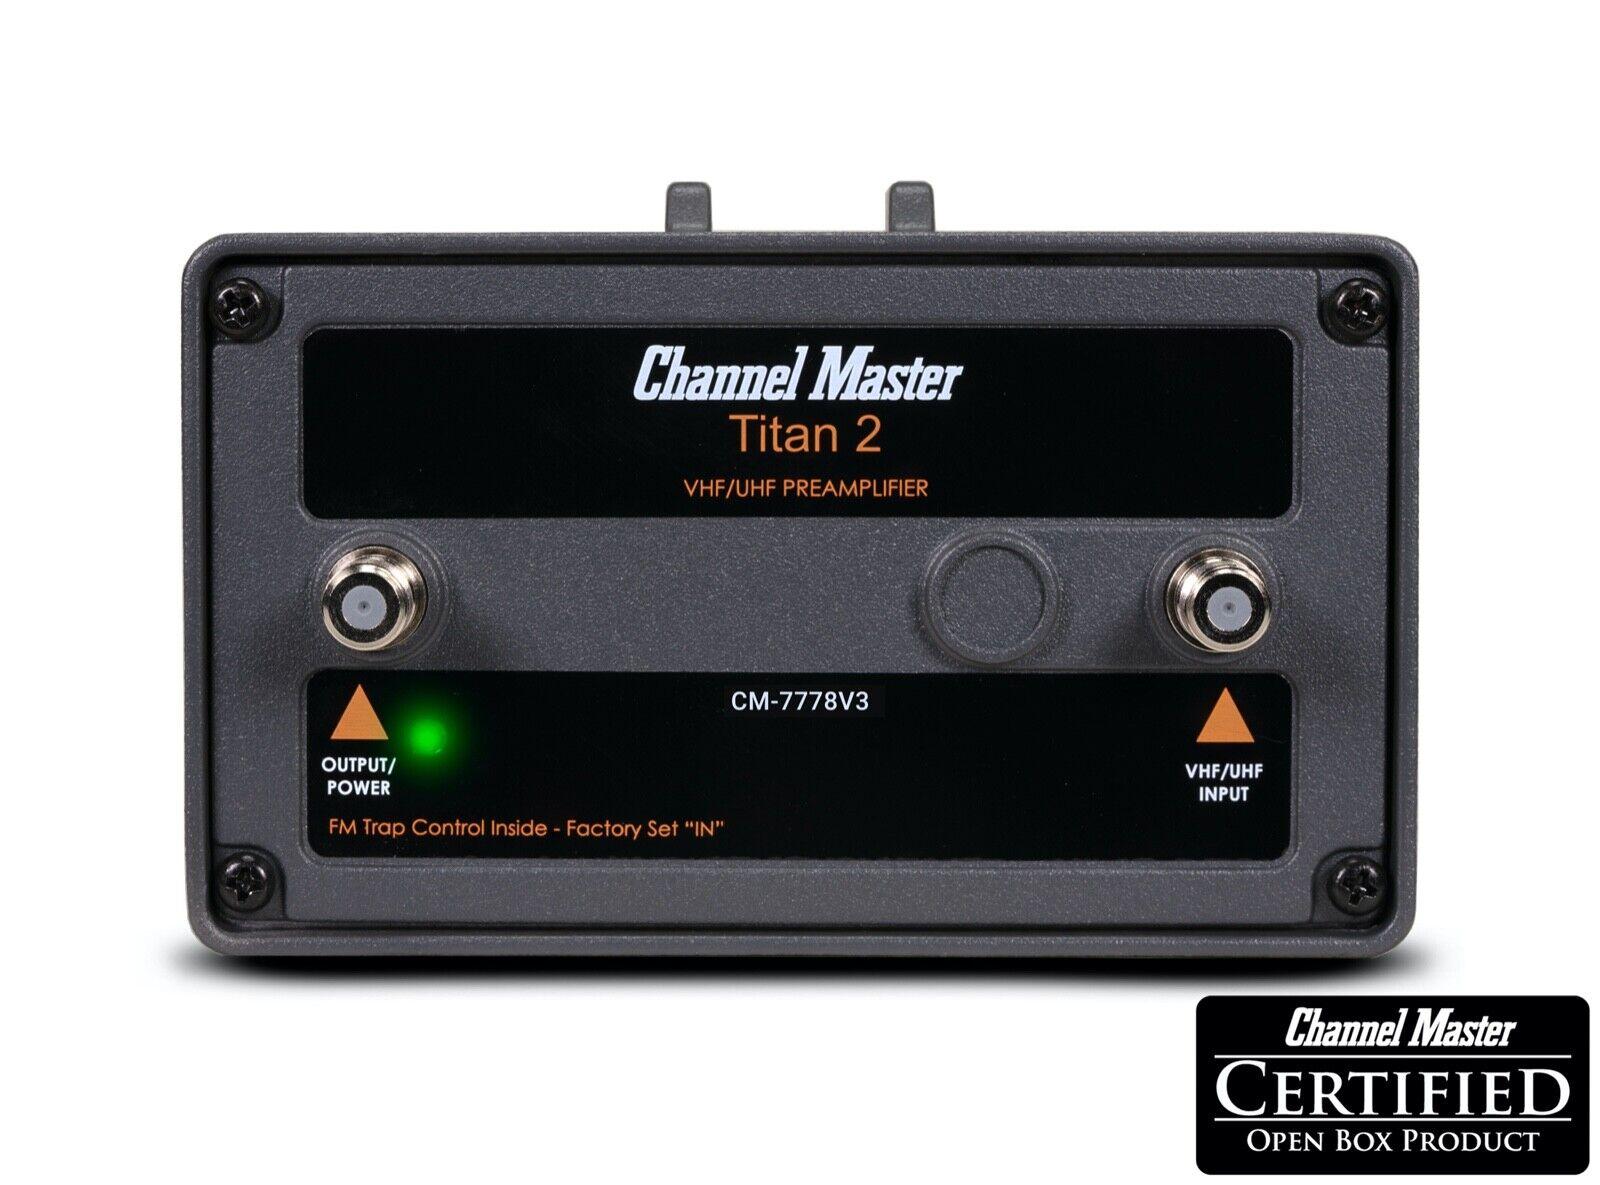 CM-7778V3 channelmasteroutlet Channel Master Titan 2 Medium Gain Preamplifier Antenna Signal Amplifier 7778V3